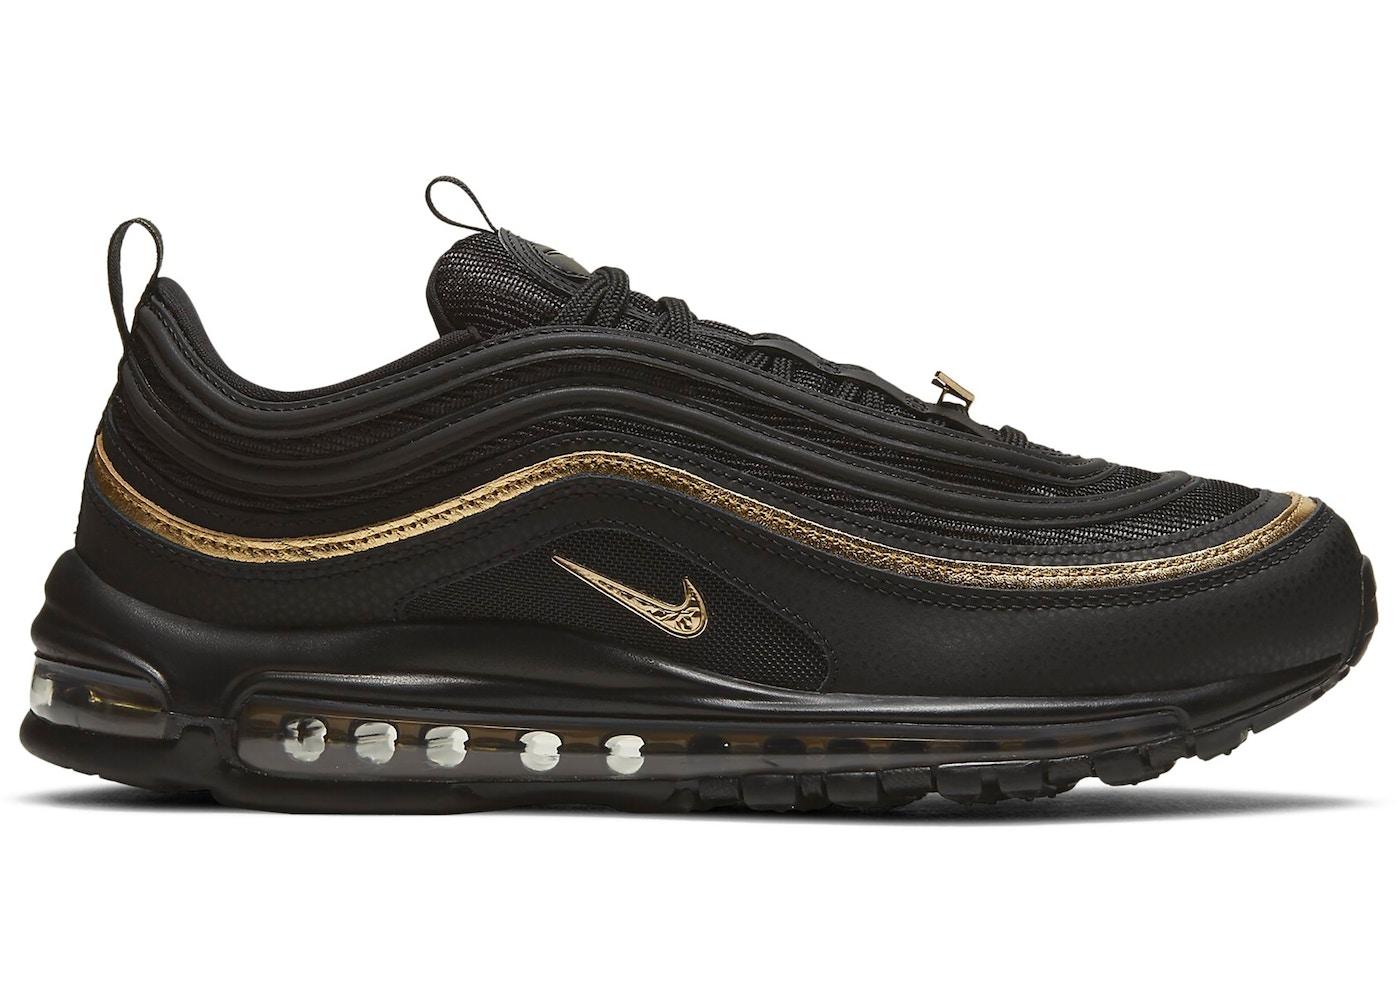 Nike Air Max 97 CM Black Metallic Gold